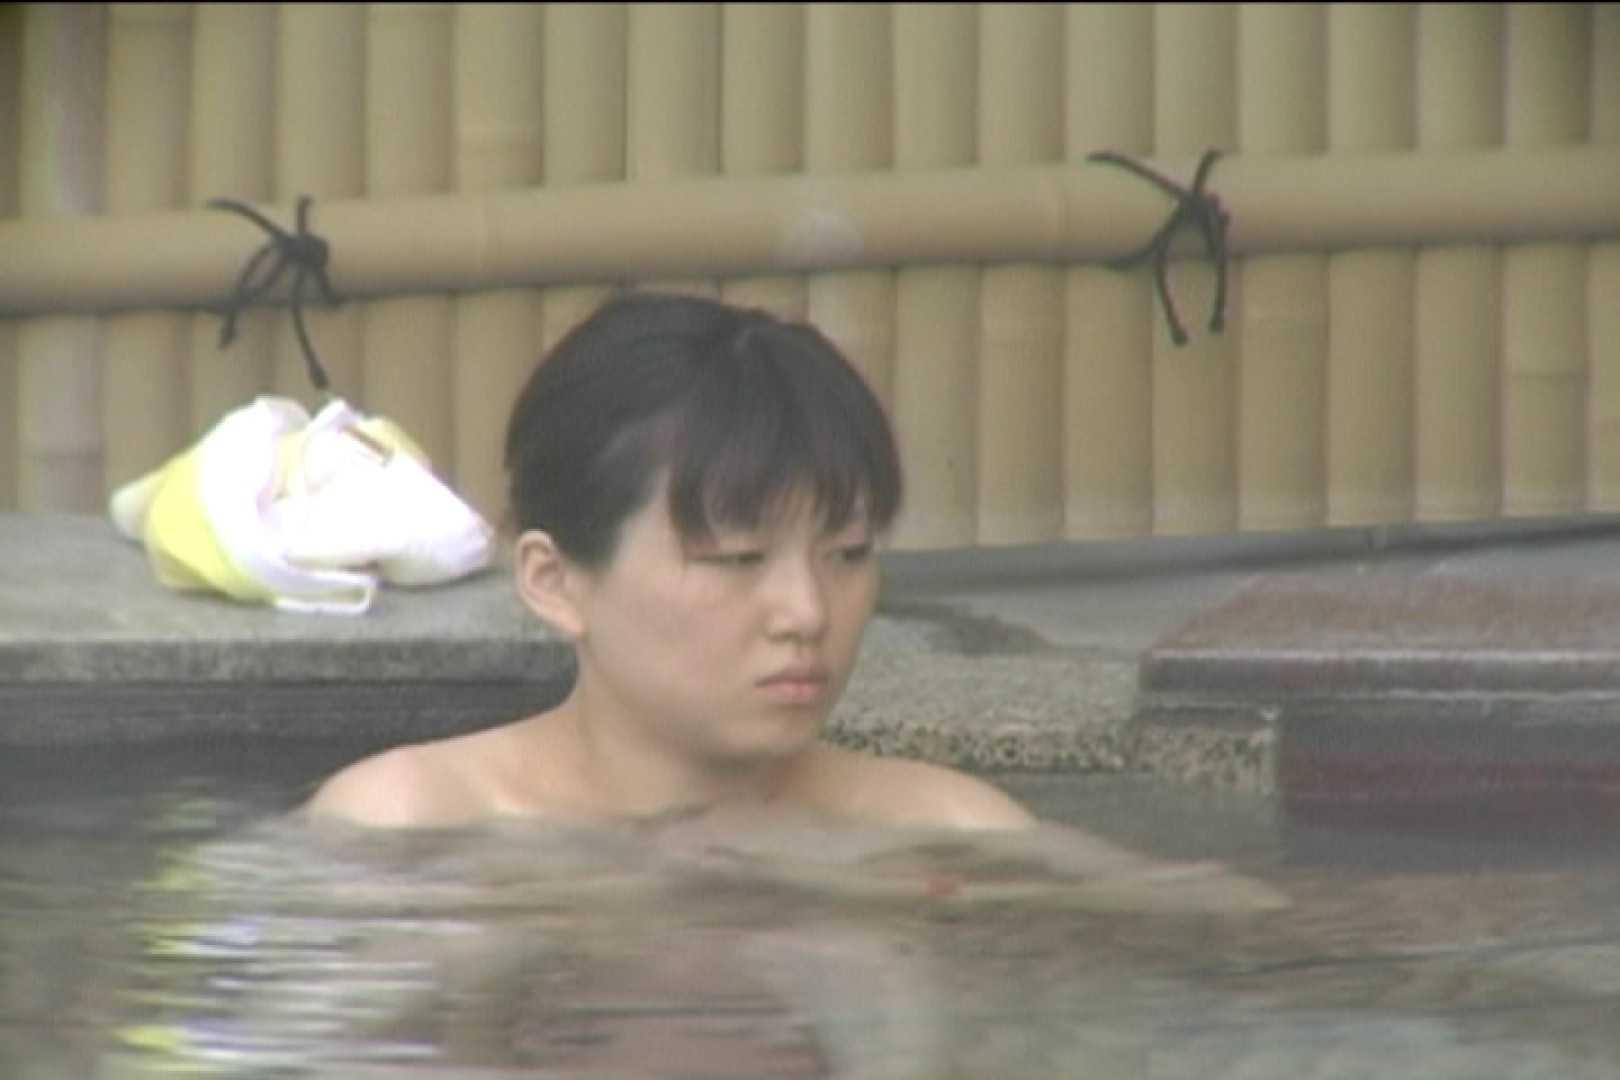 Aquaな露天風呂Vol.121 女体盗撮 隠し撮りAV無料 89連発 17